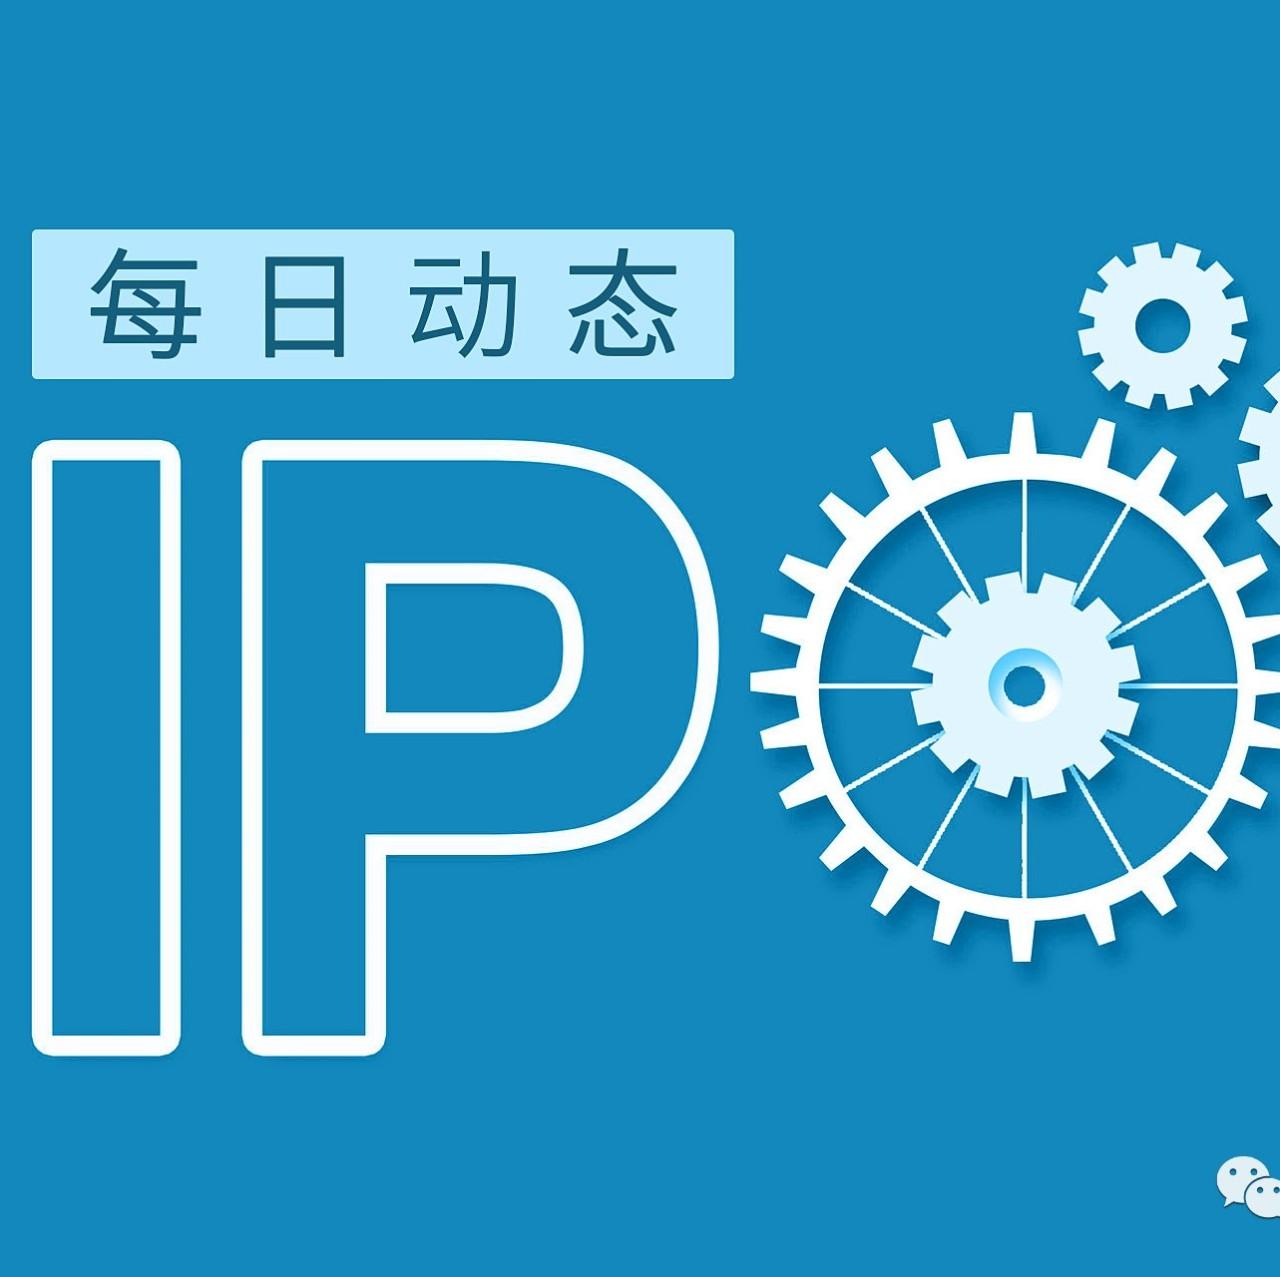 IPO每日动态 | 科创板今日开板,海尔生物科创板更新招股书,澎湃新闻入股趣头条(附2019 IPO名单)